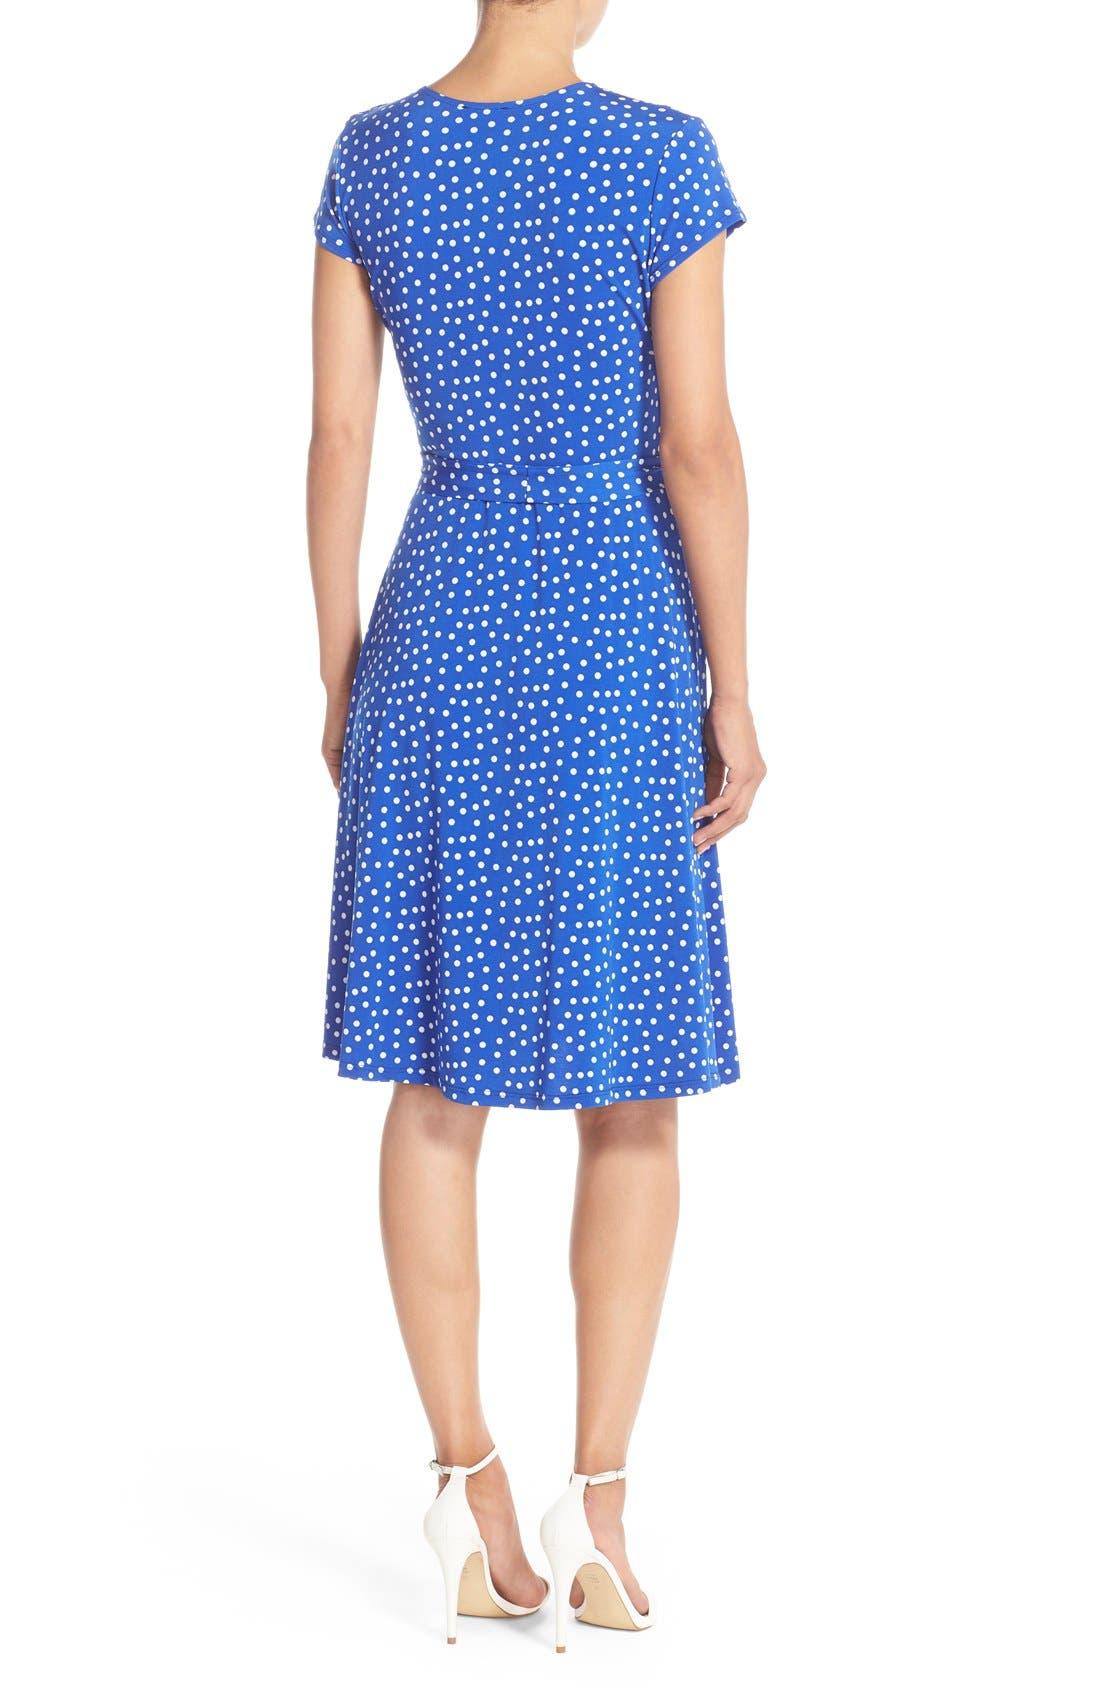 Alternate Image 2  - Leota 'Perfect' Faux Wrap Polka Dot Jersey Dress